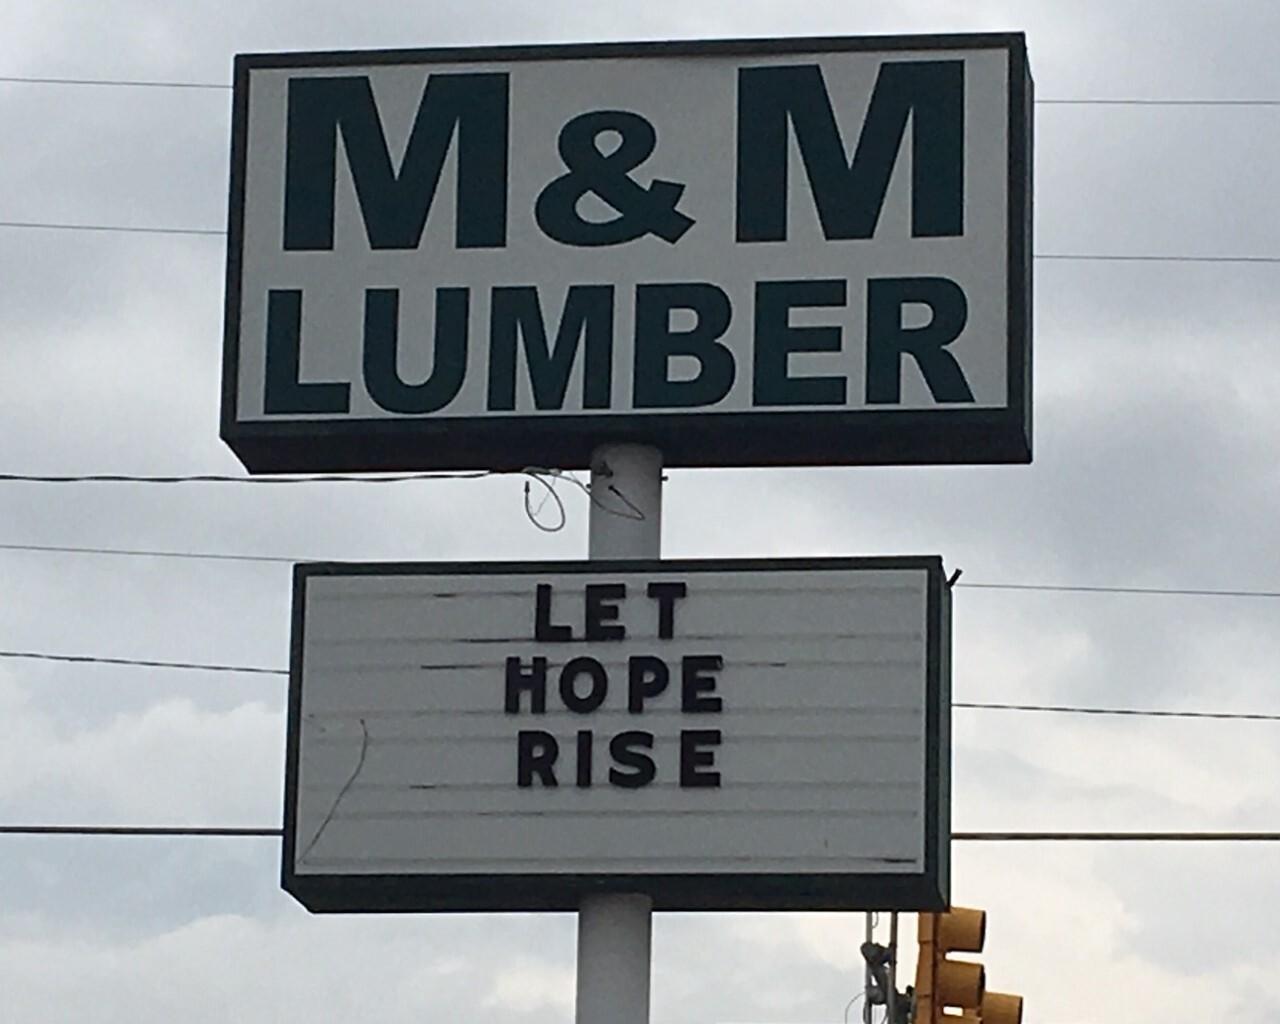 M&M Lumber - Let Hope Rise sign